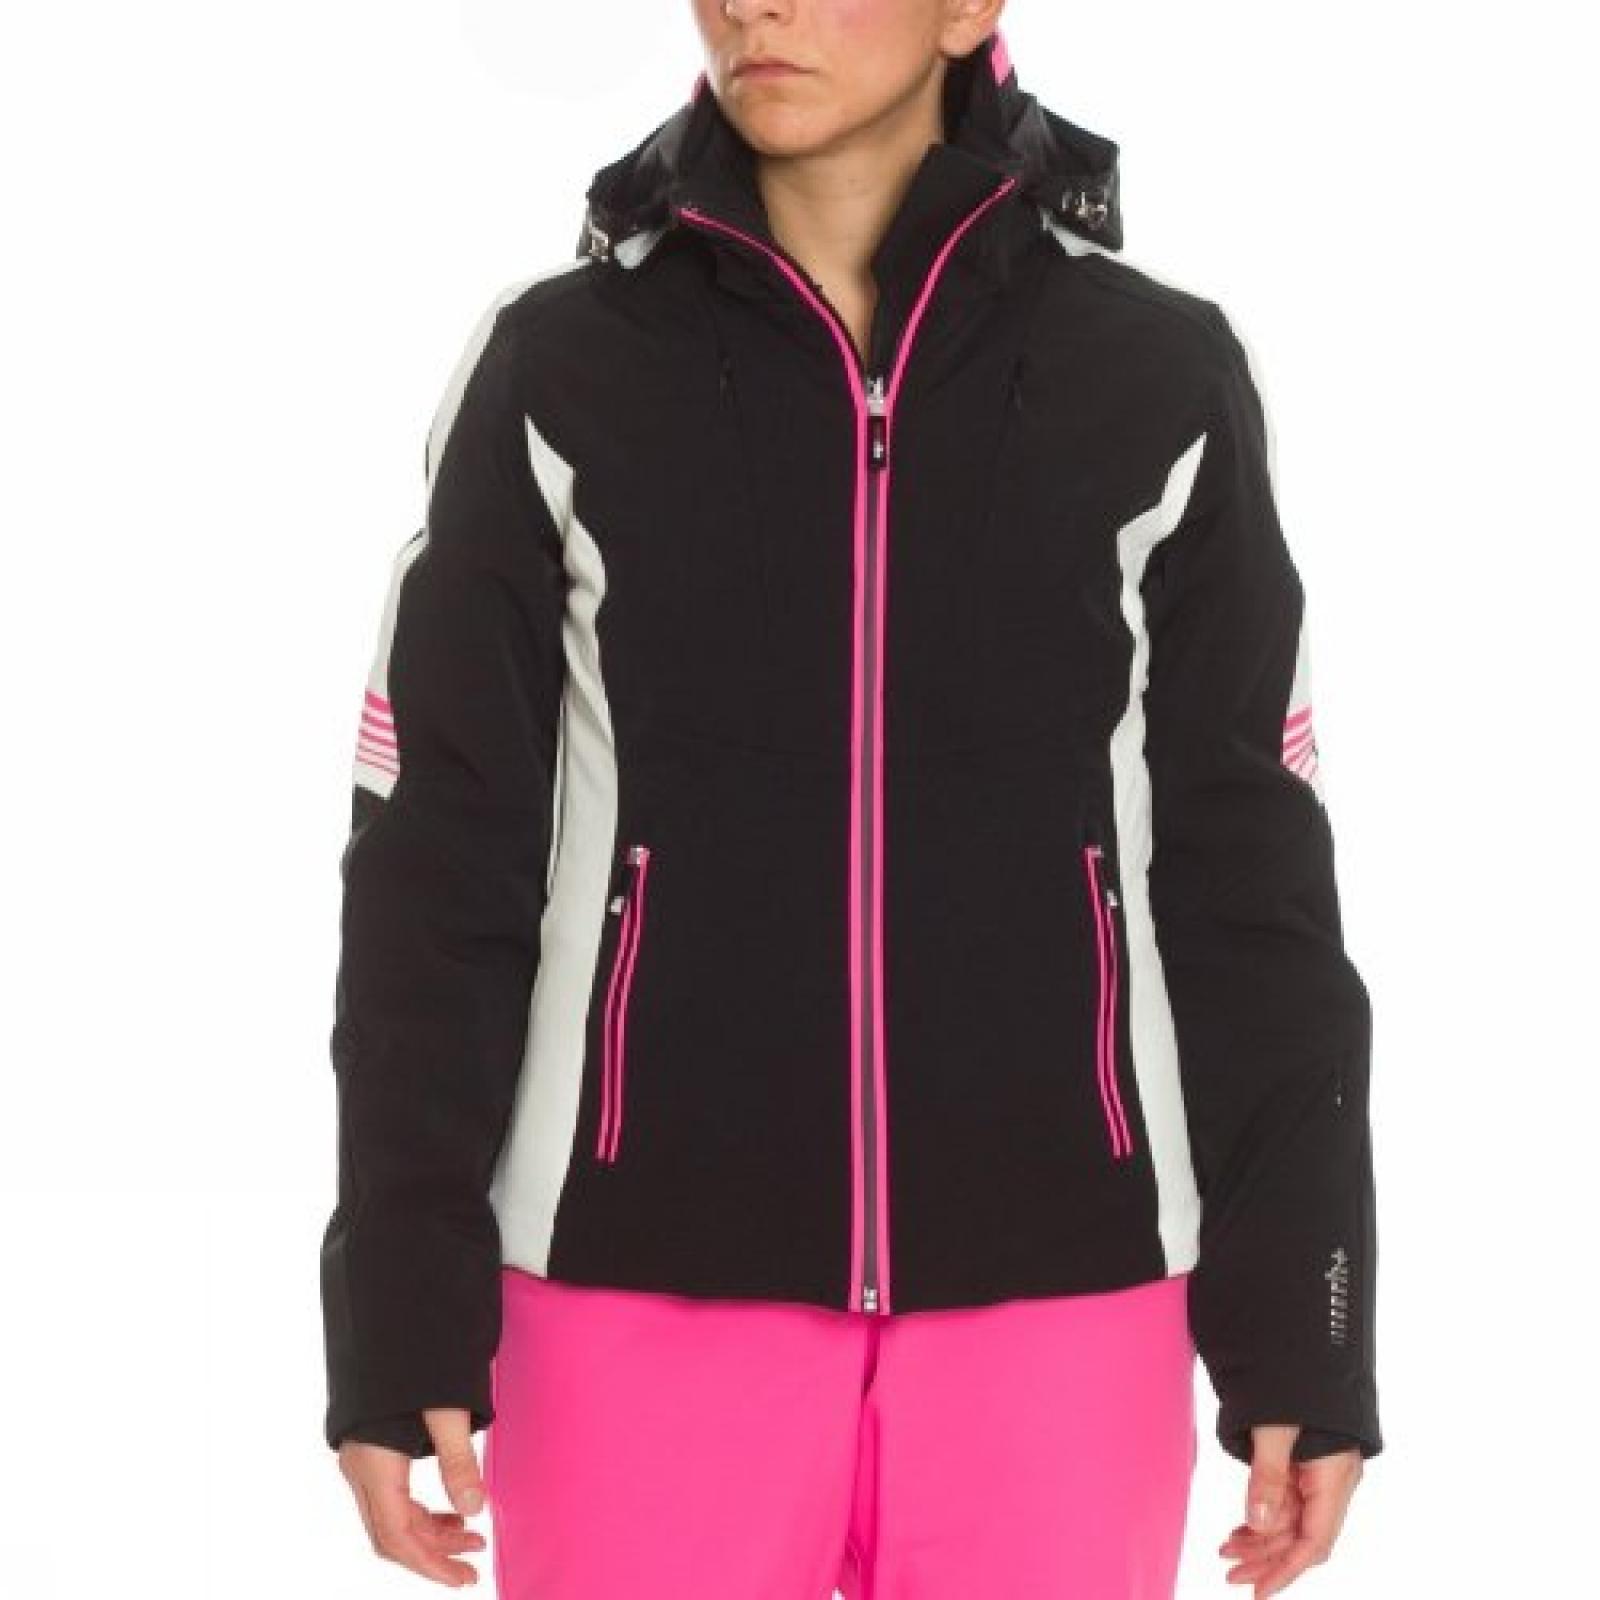 Zerorh+ Daja W Jacket Black Jacke Blouson Mantel Damen Ski,